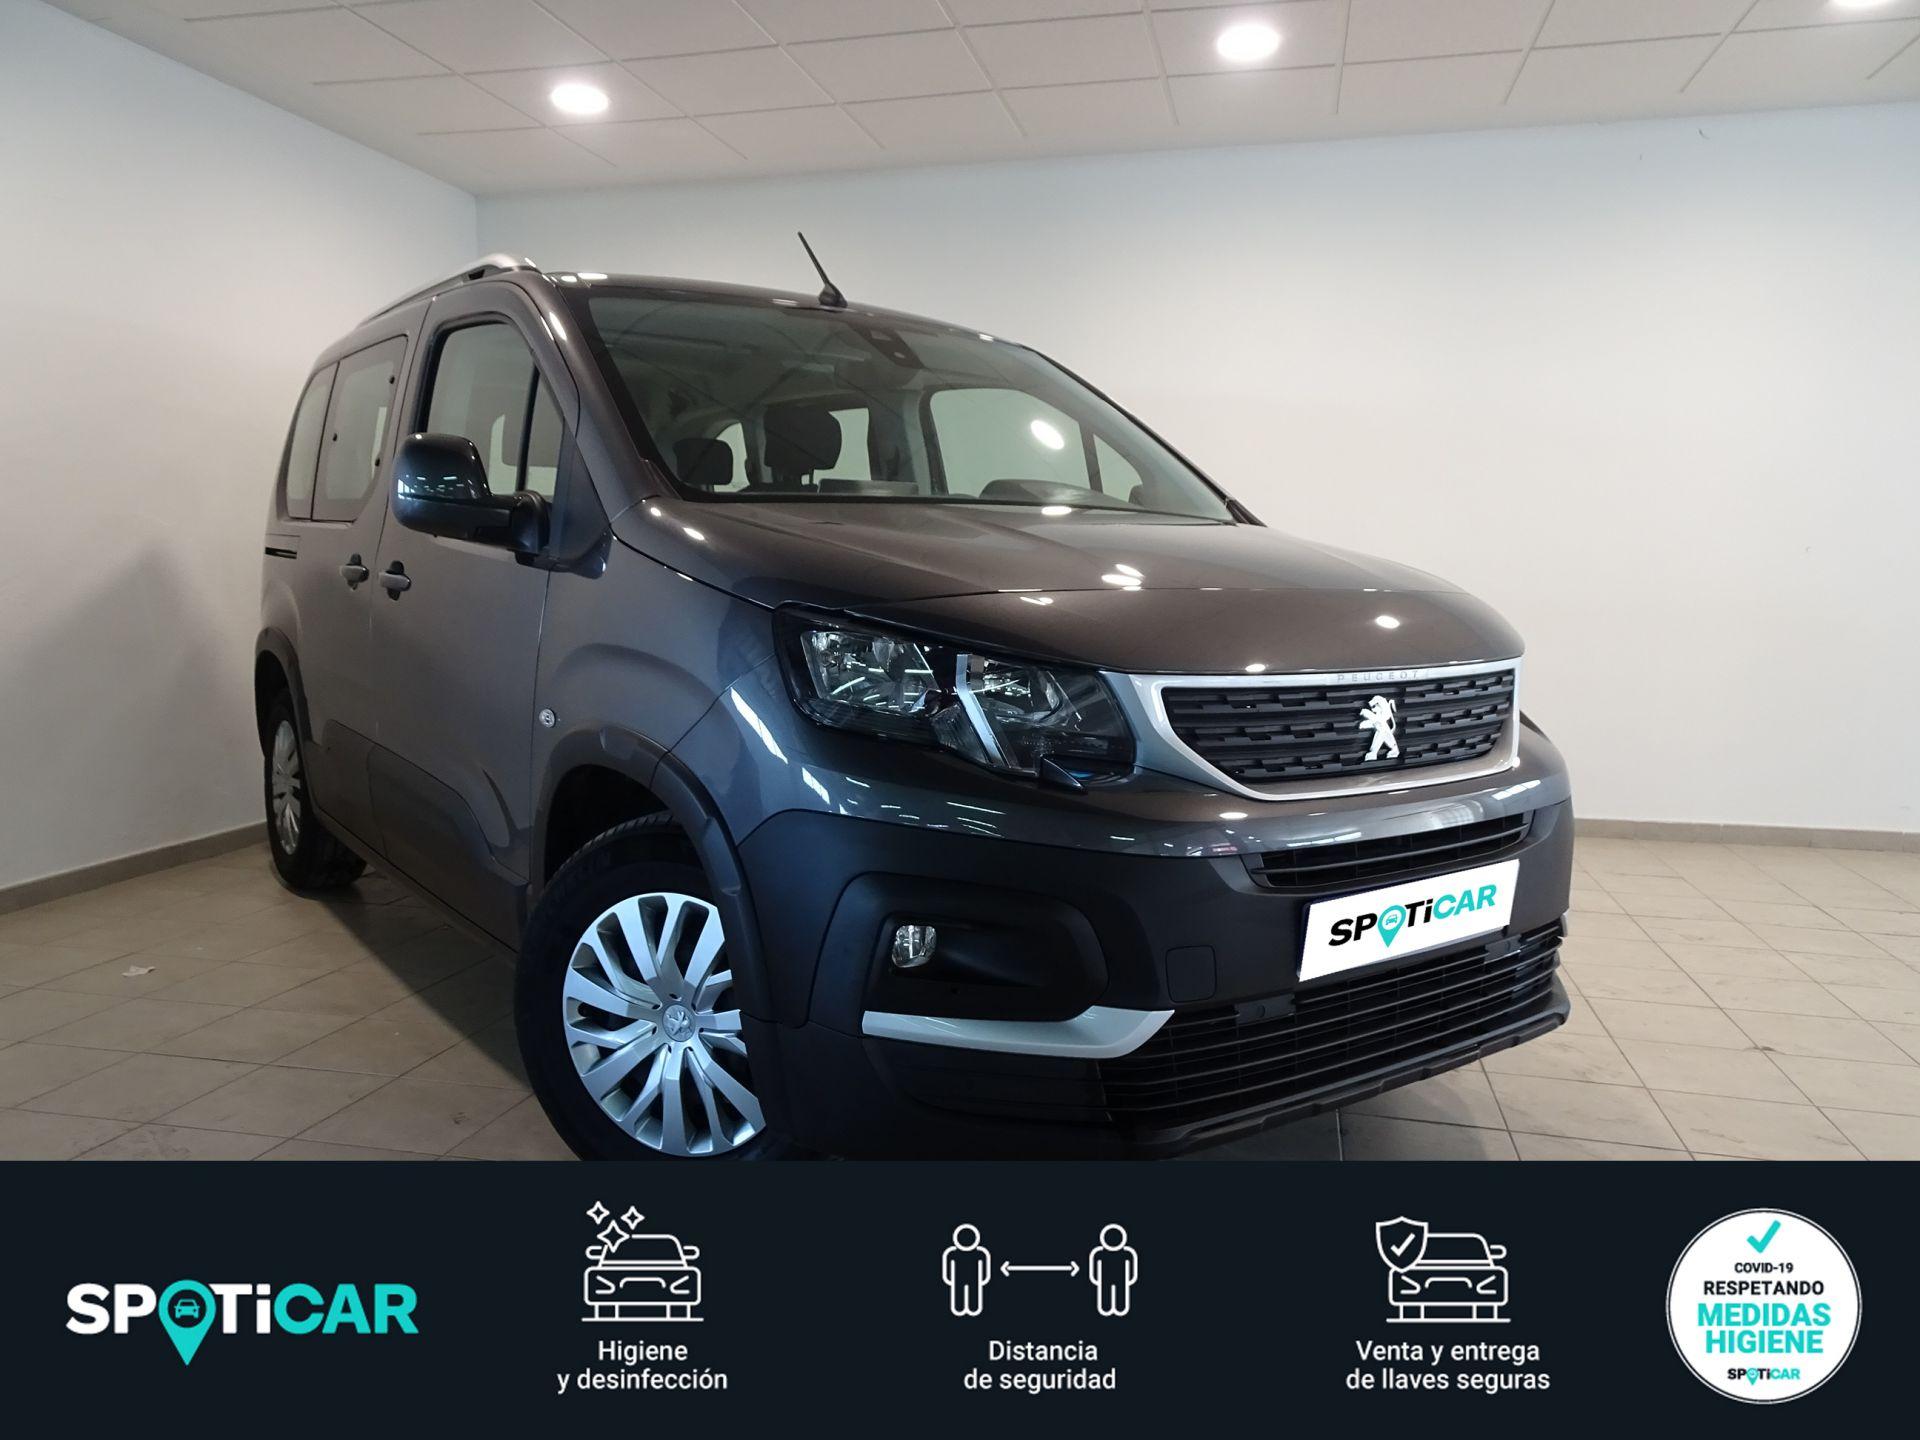 Peugeot Rifter ACTIVE 1.5. BLUEHDI 100CV segunda mano Cádiz